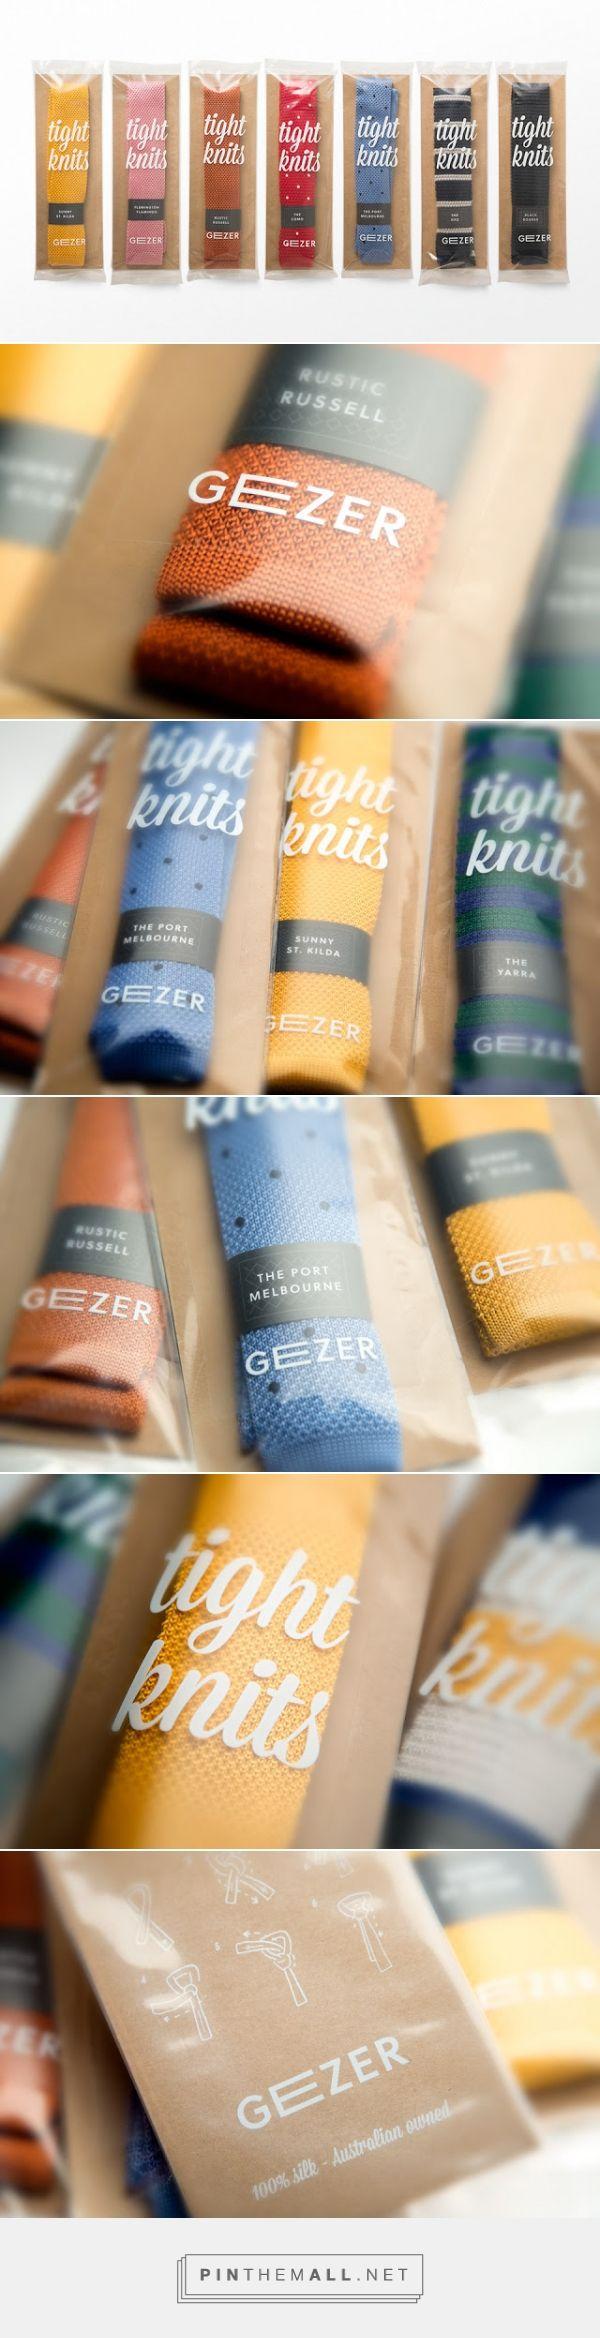 Geezer / online fashion company / tie